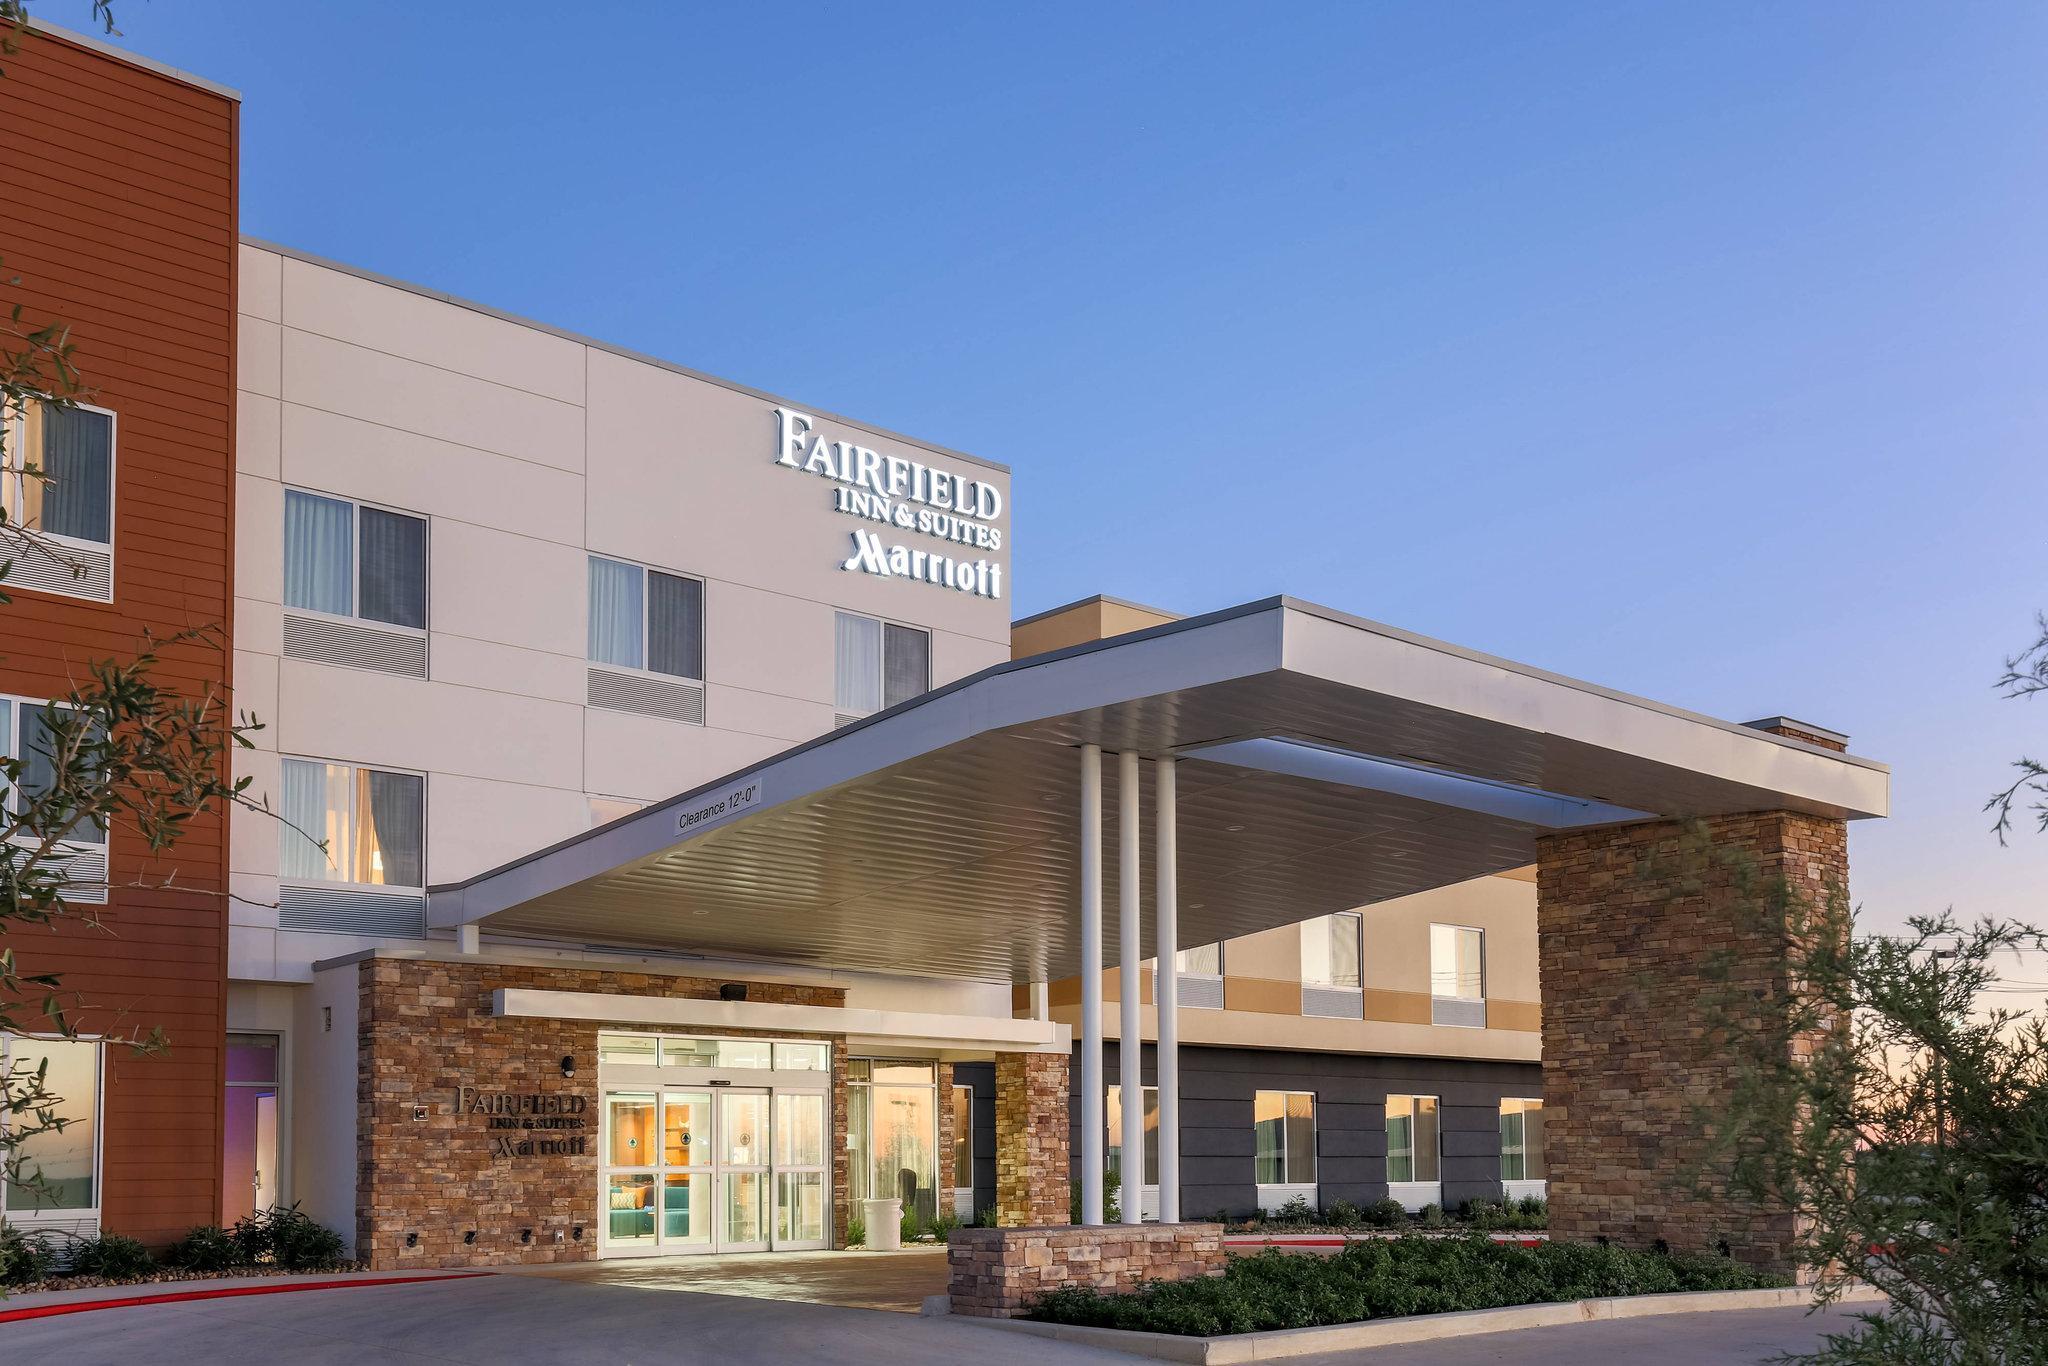 Fairfield Inn And Suites Pleasanton